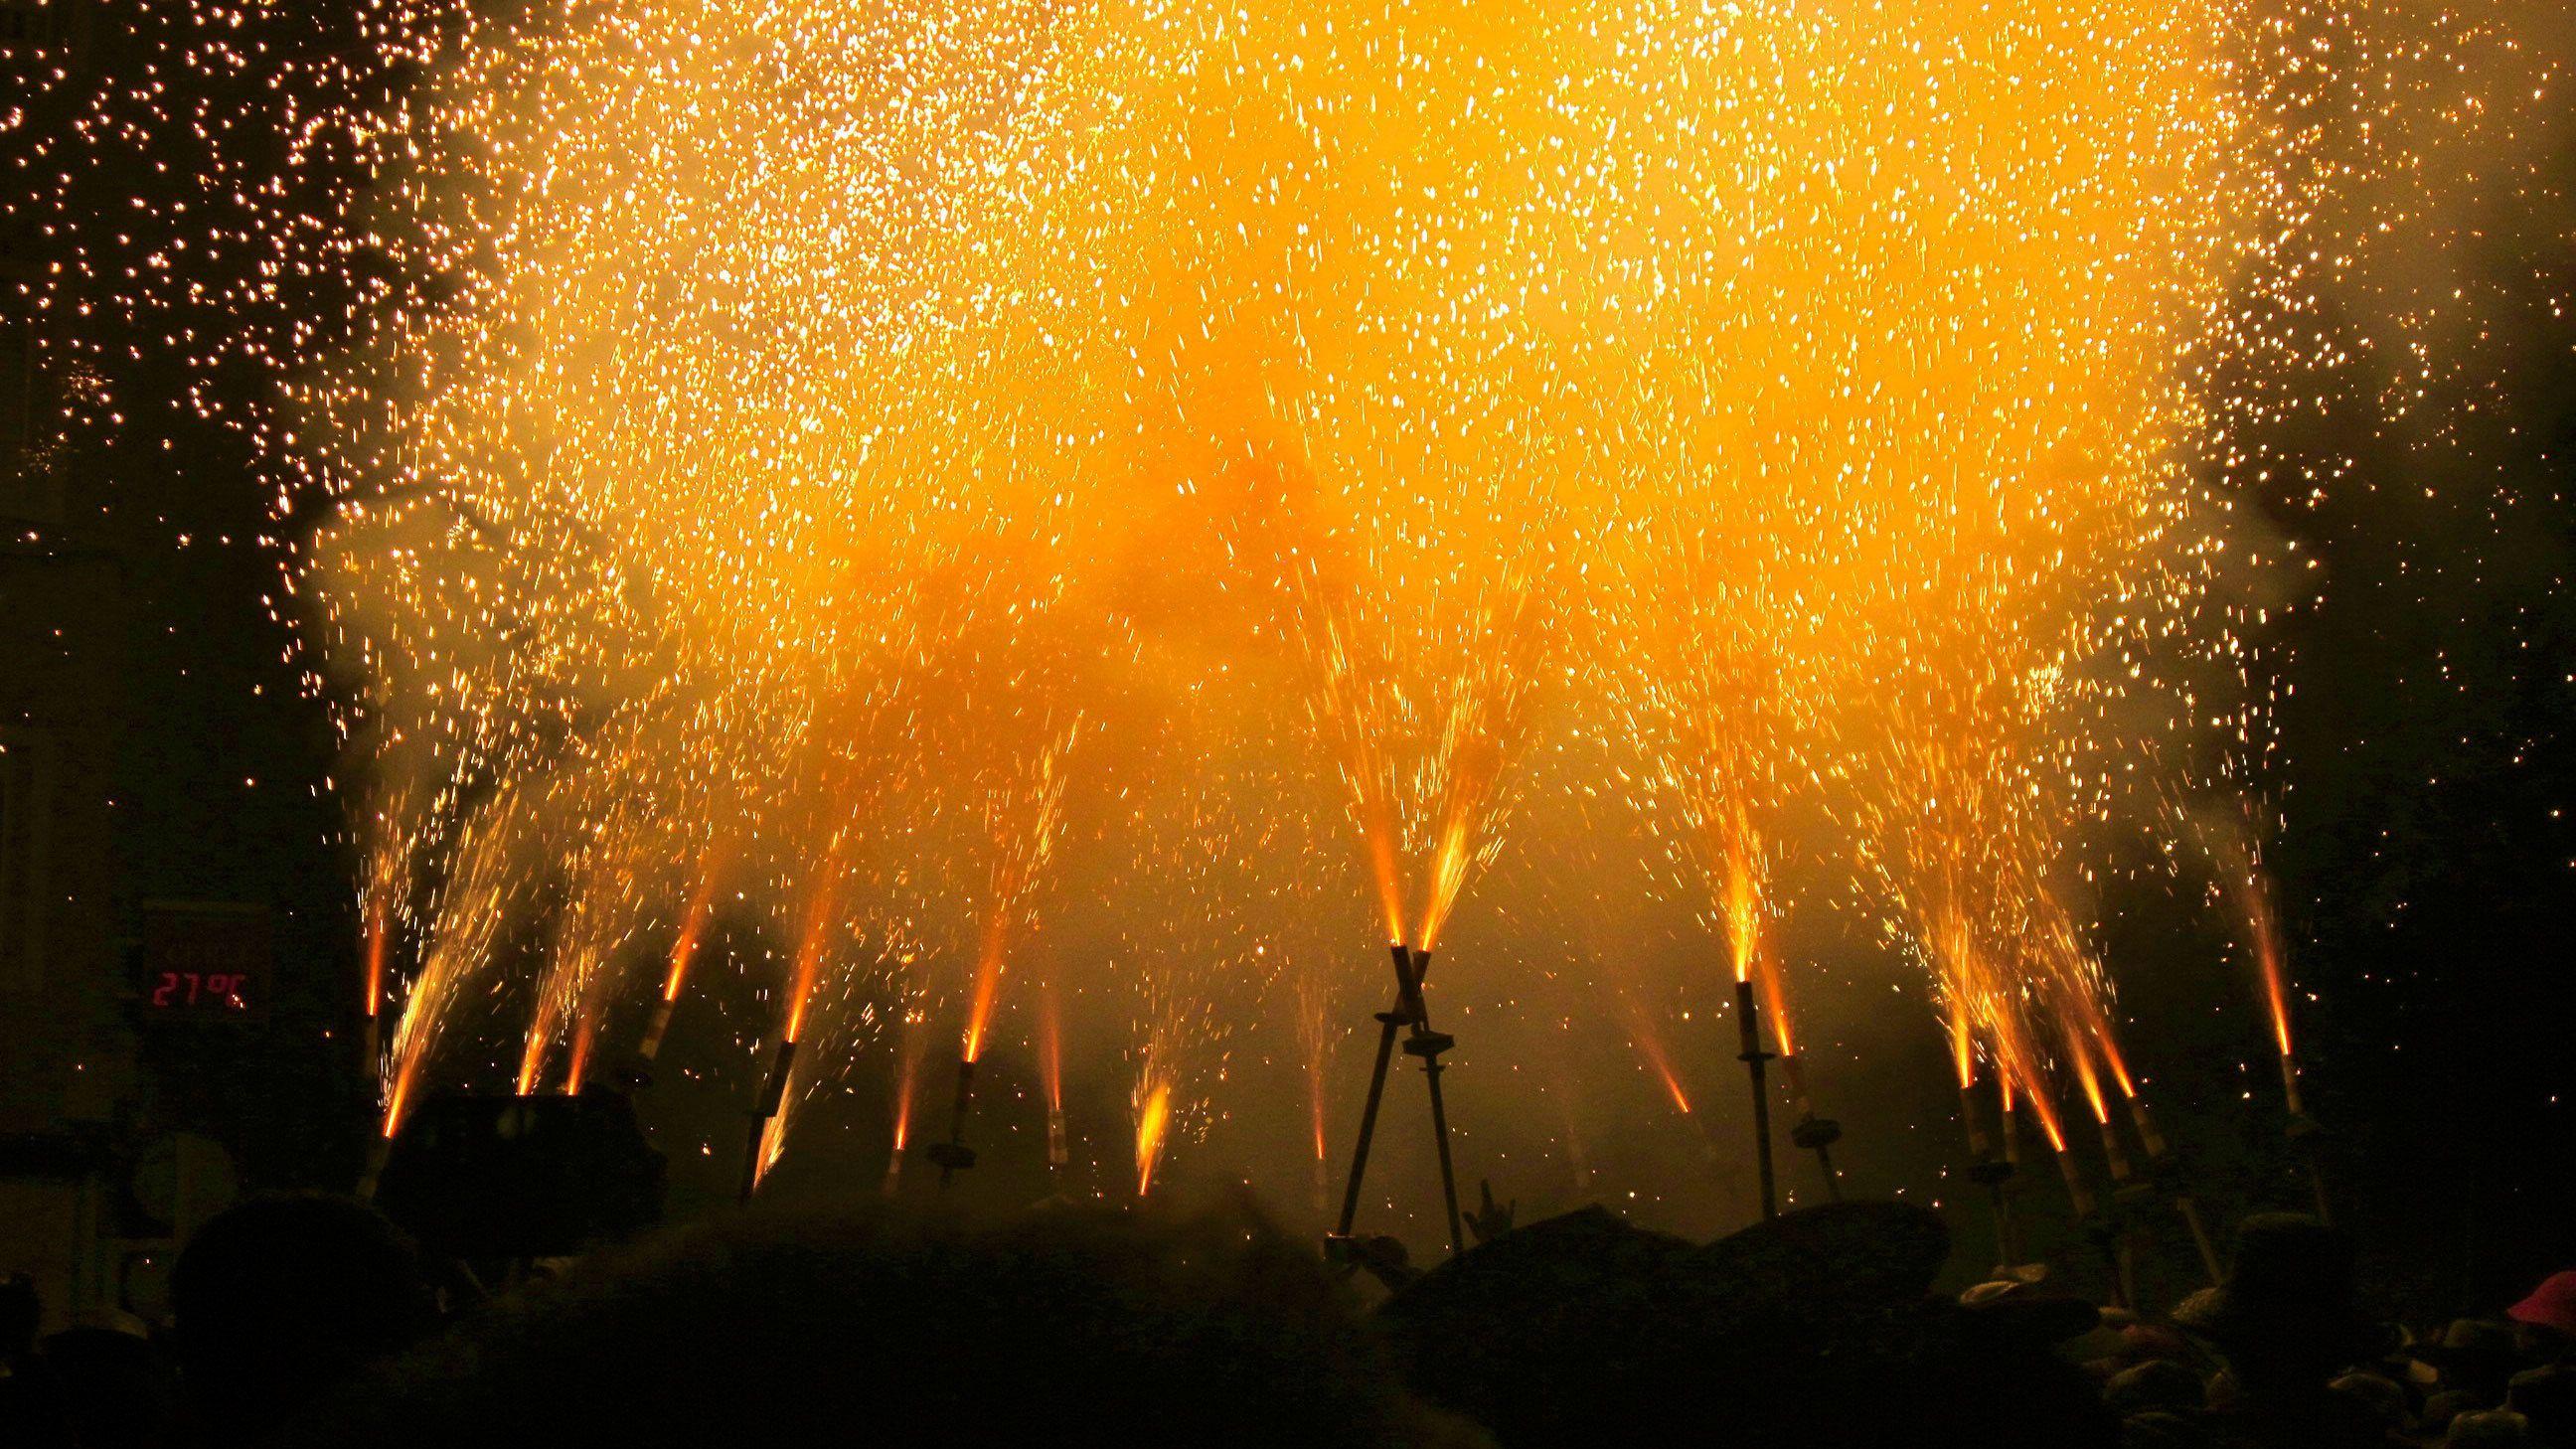 group of people lighting fireworks for correfoc celebration in Barcelona